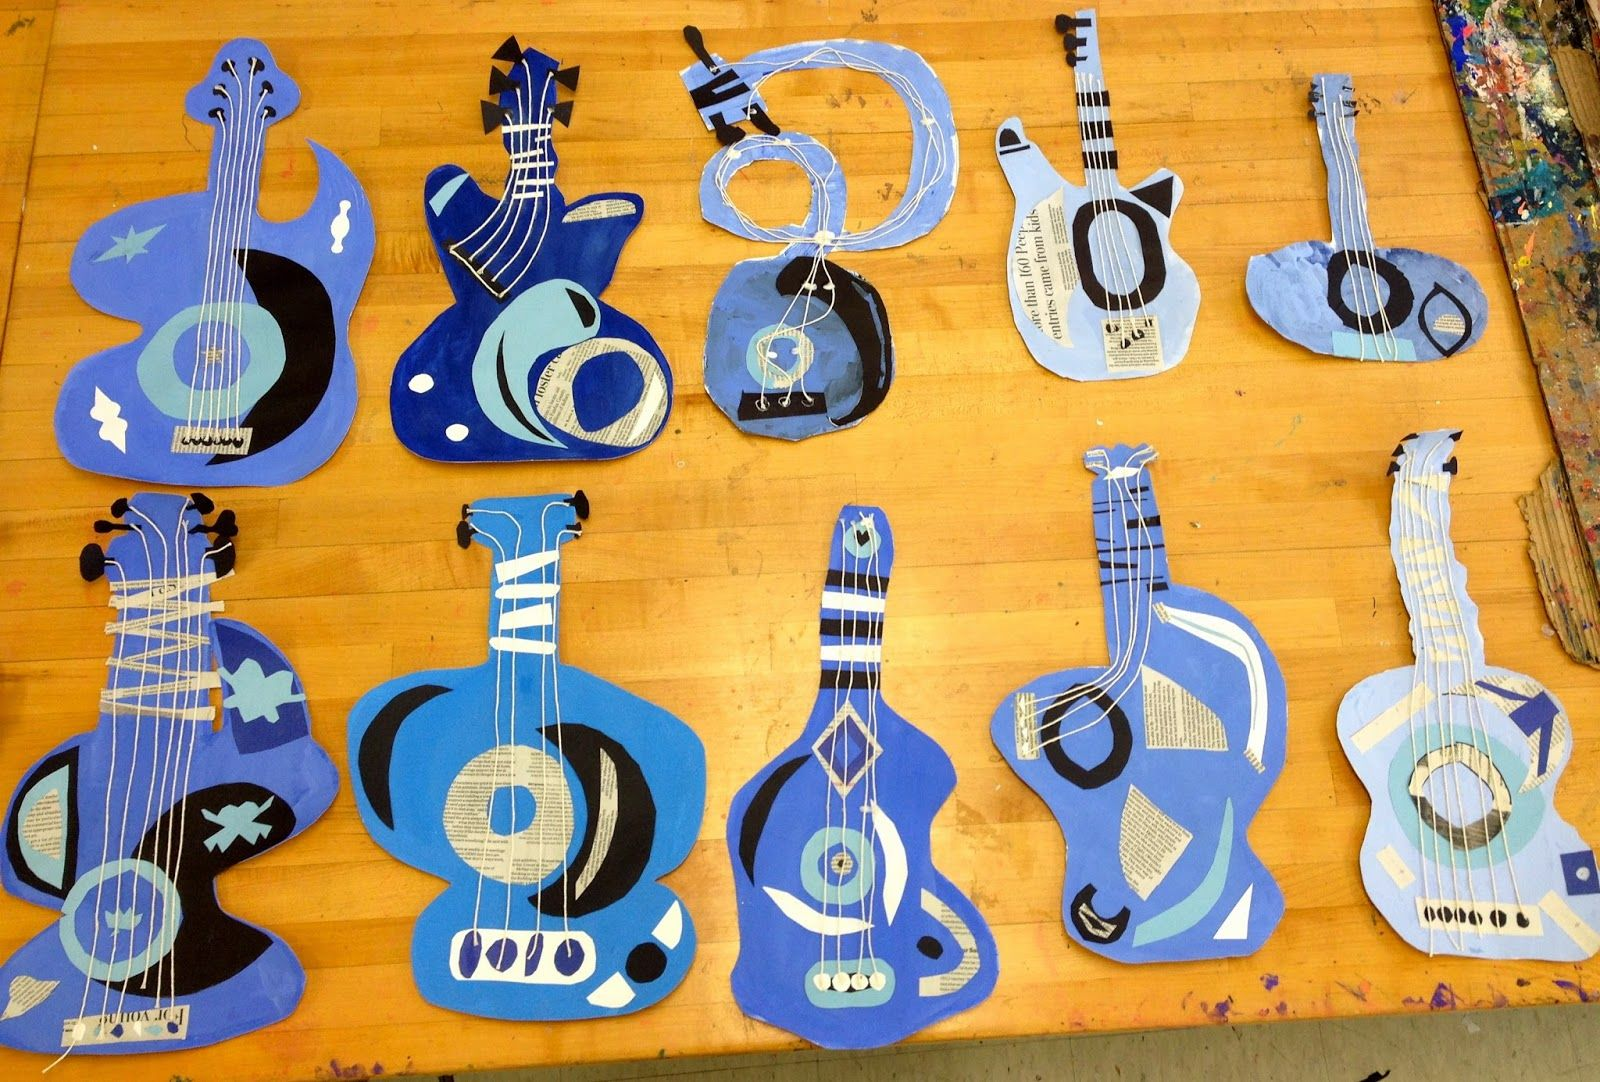 5th Grade Picasso Blue Period Guitars